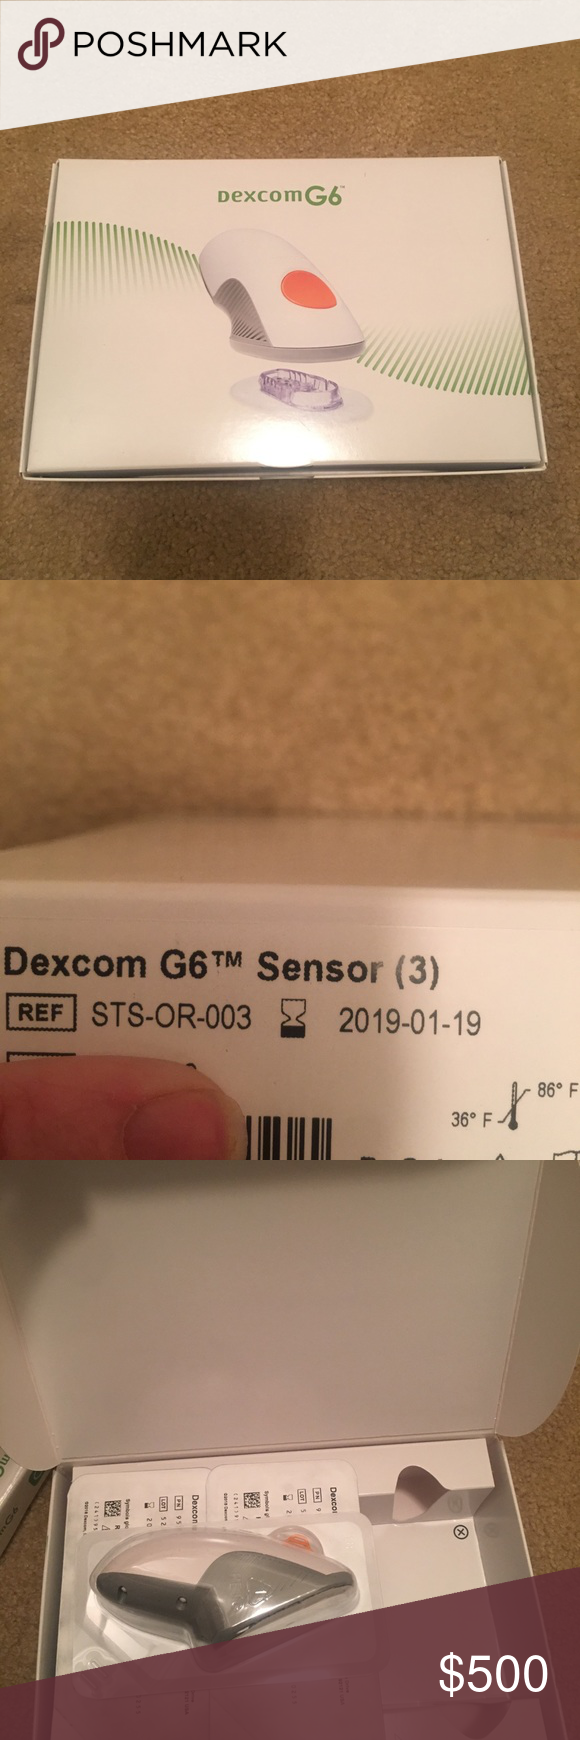 G6 Sensors Brand New box of G6 Sensors box